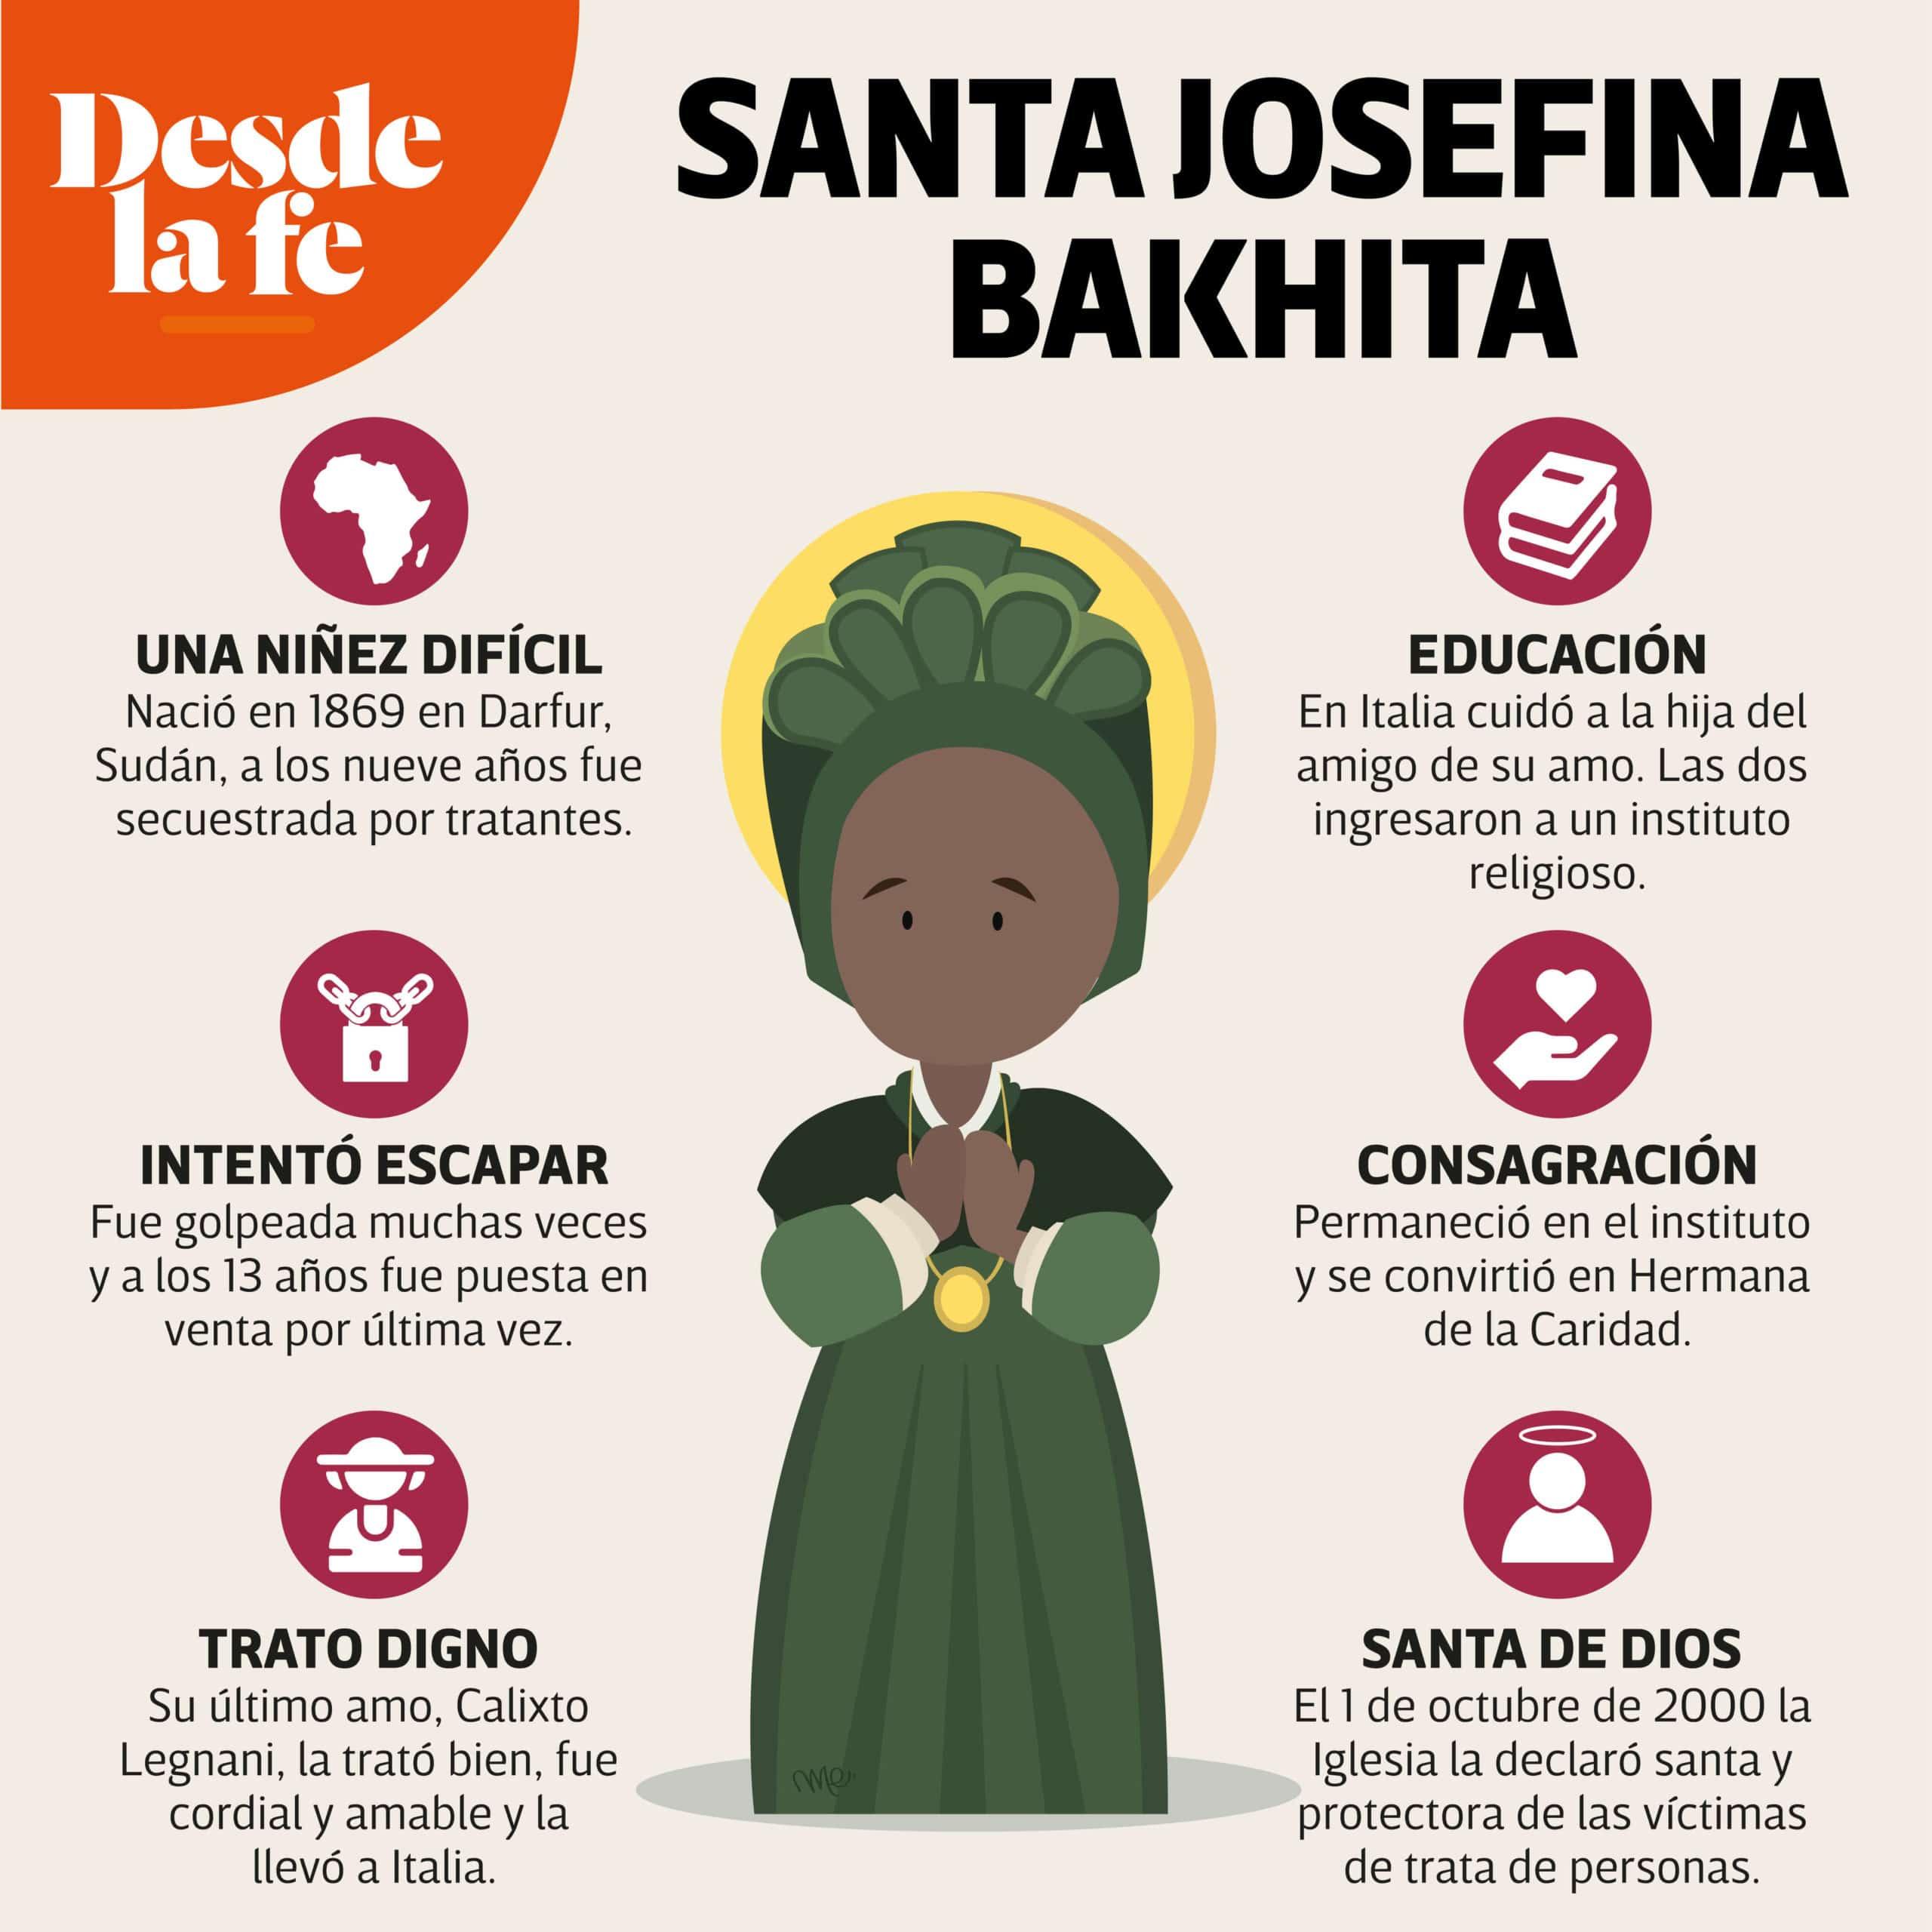 Santa Josefina Bakhita.